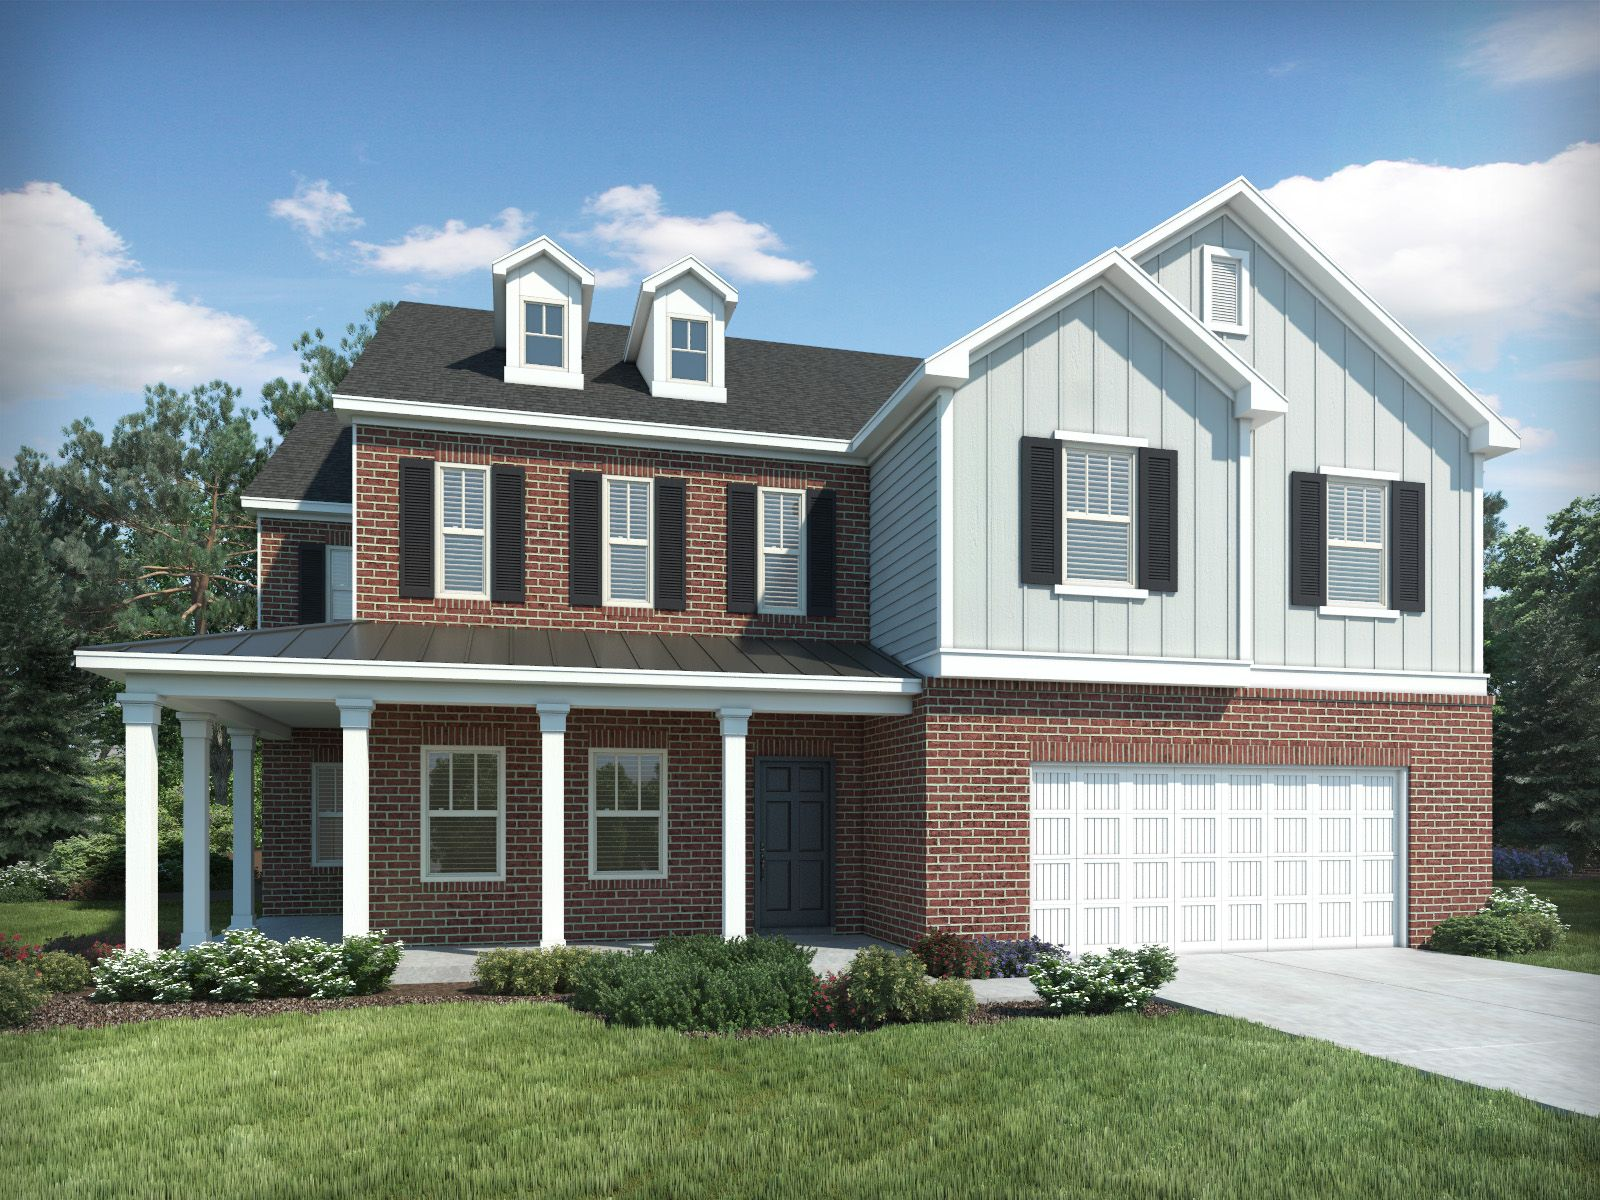 New Home Construction Plans In Atlanta Ga View 6 359